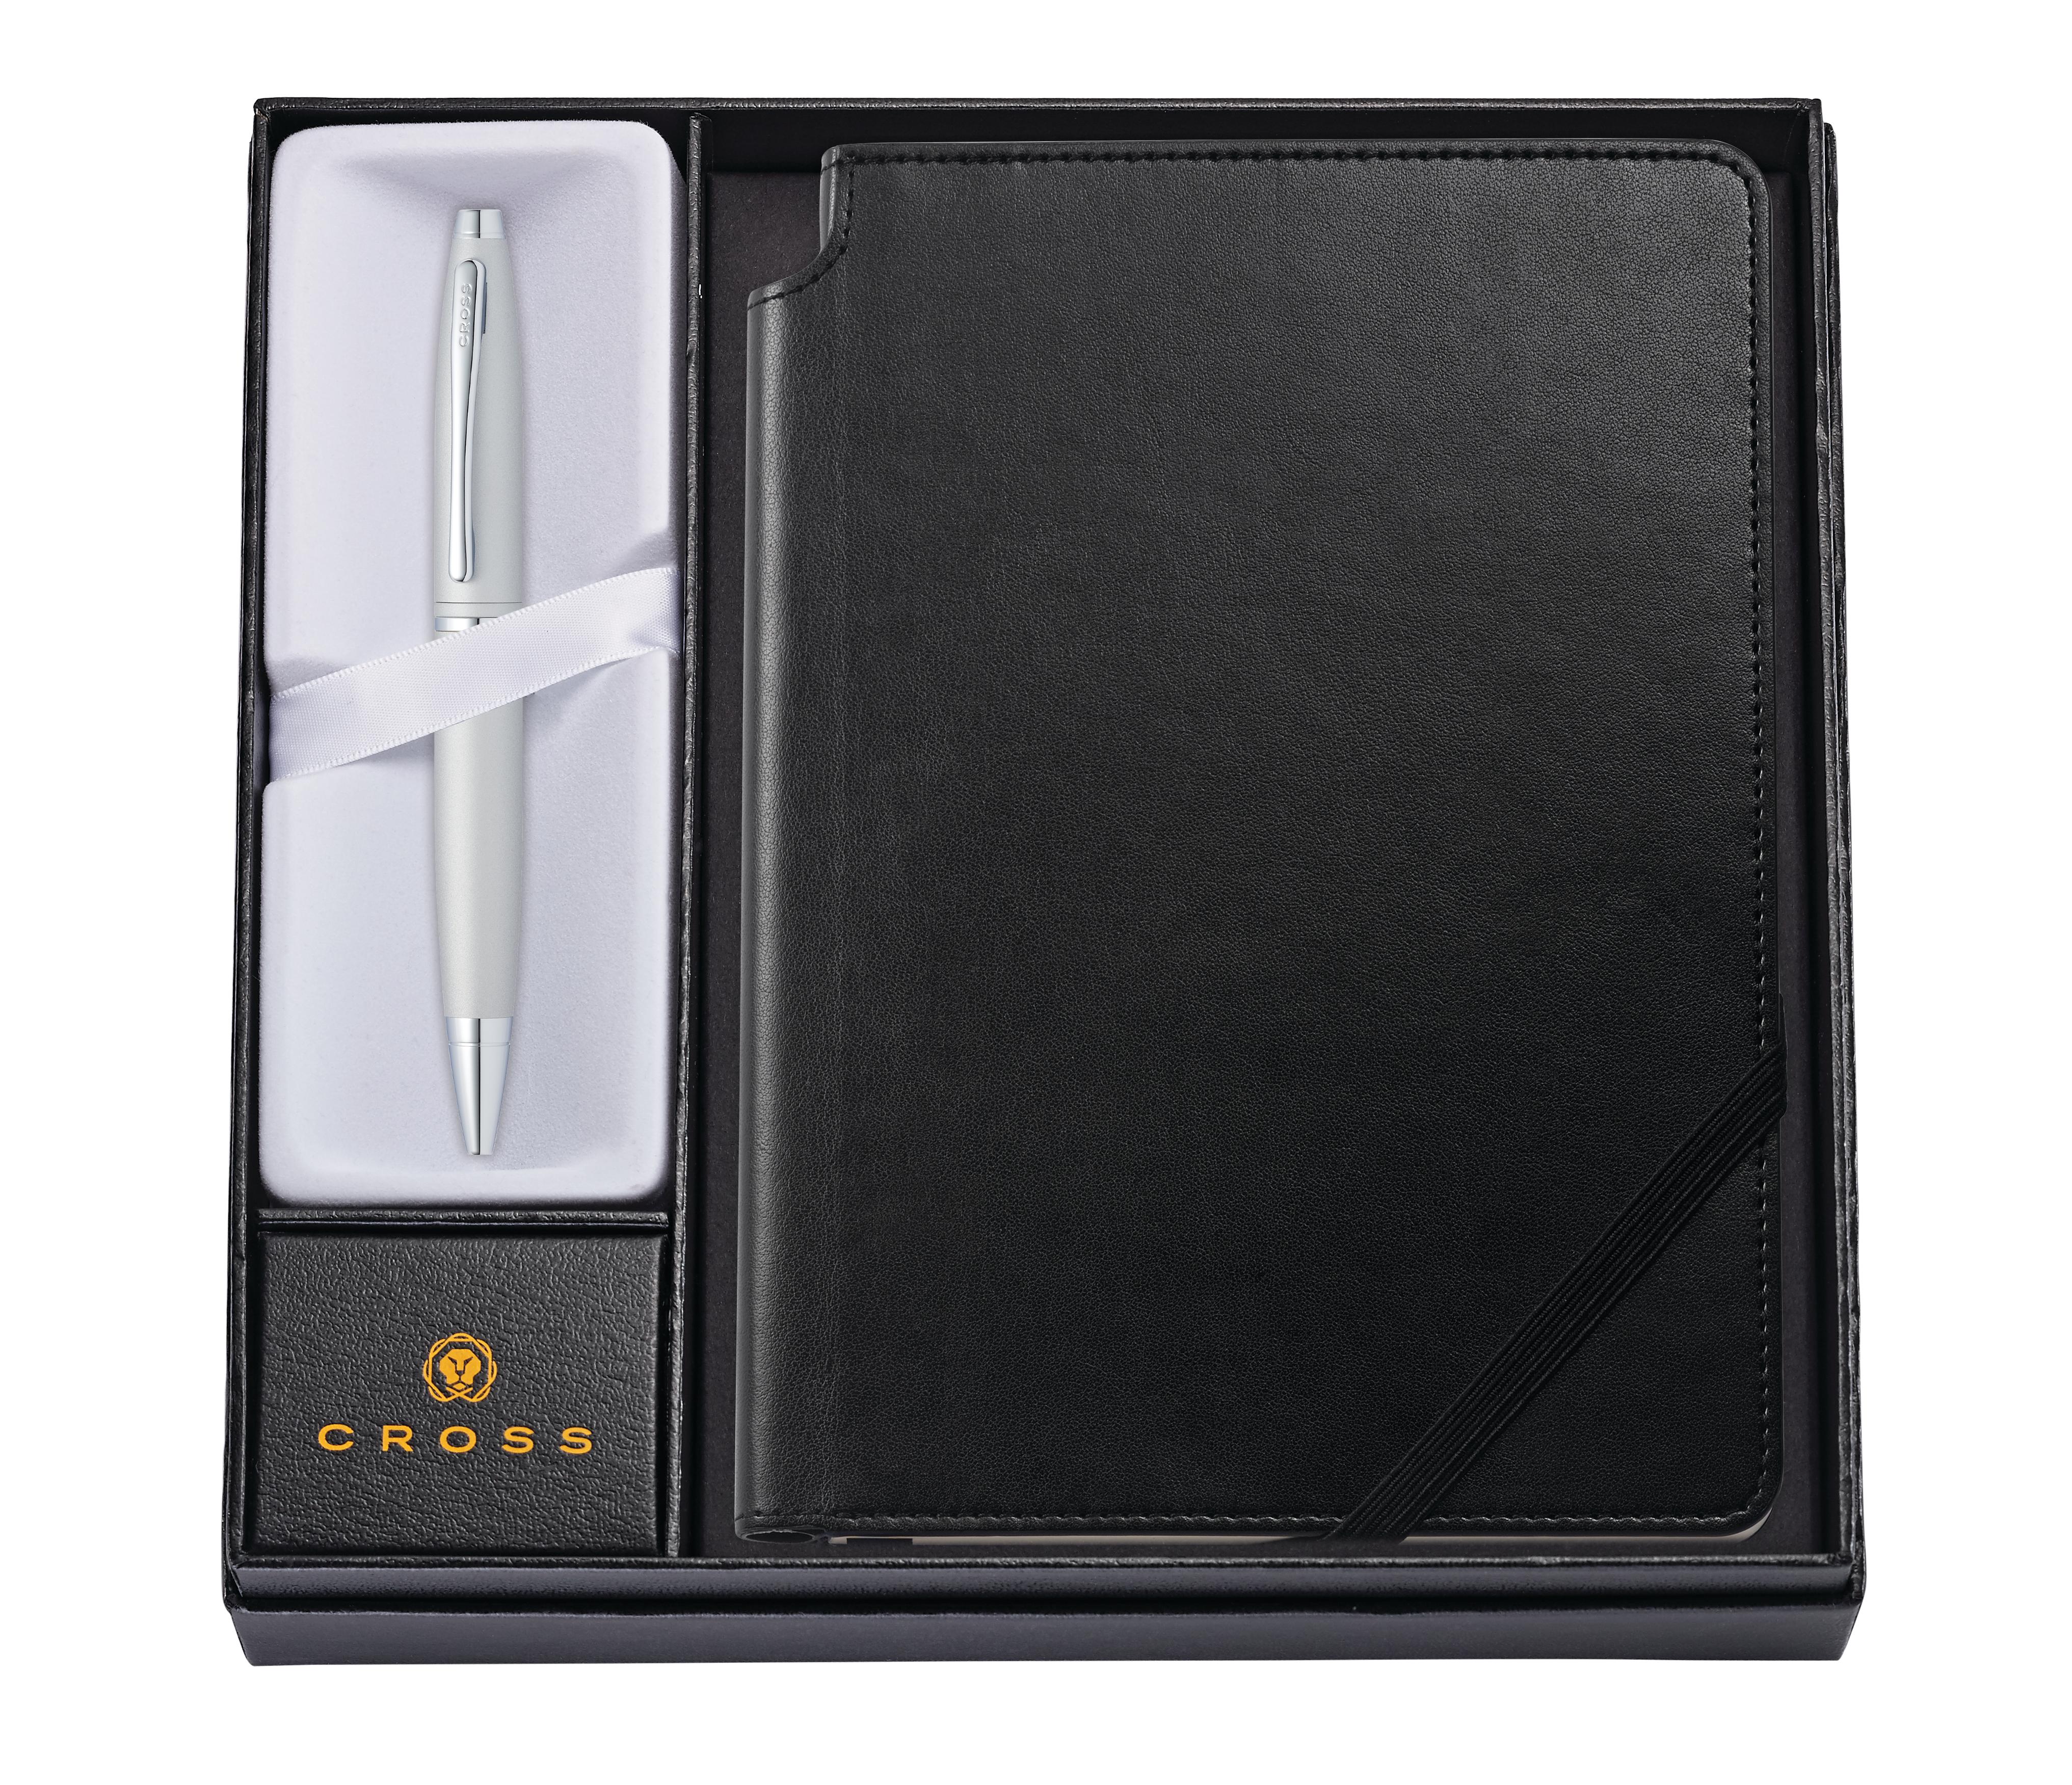 Calais Satin Chrome Ballpoint Pen with Medium Classic Black Journal